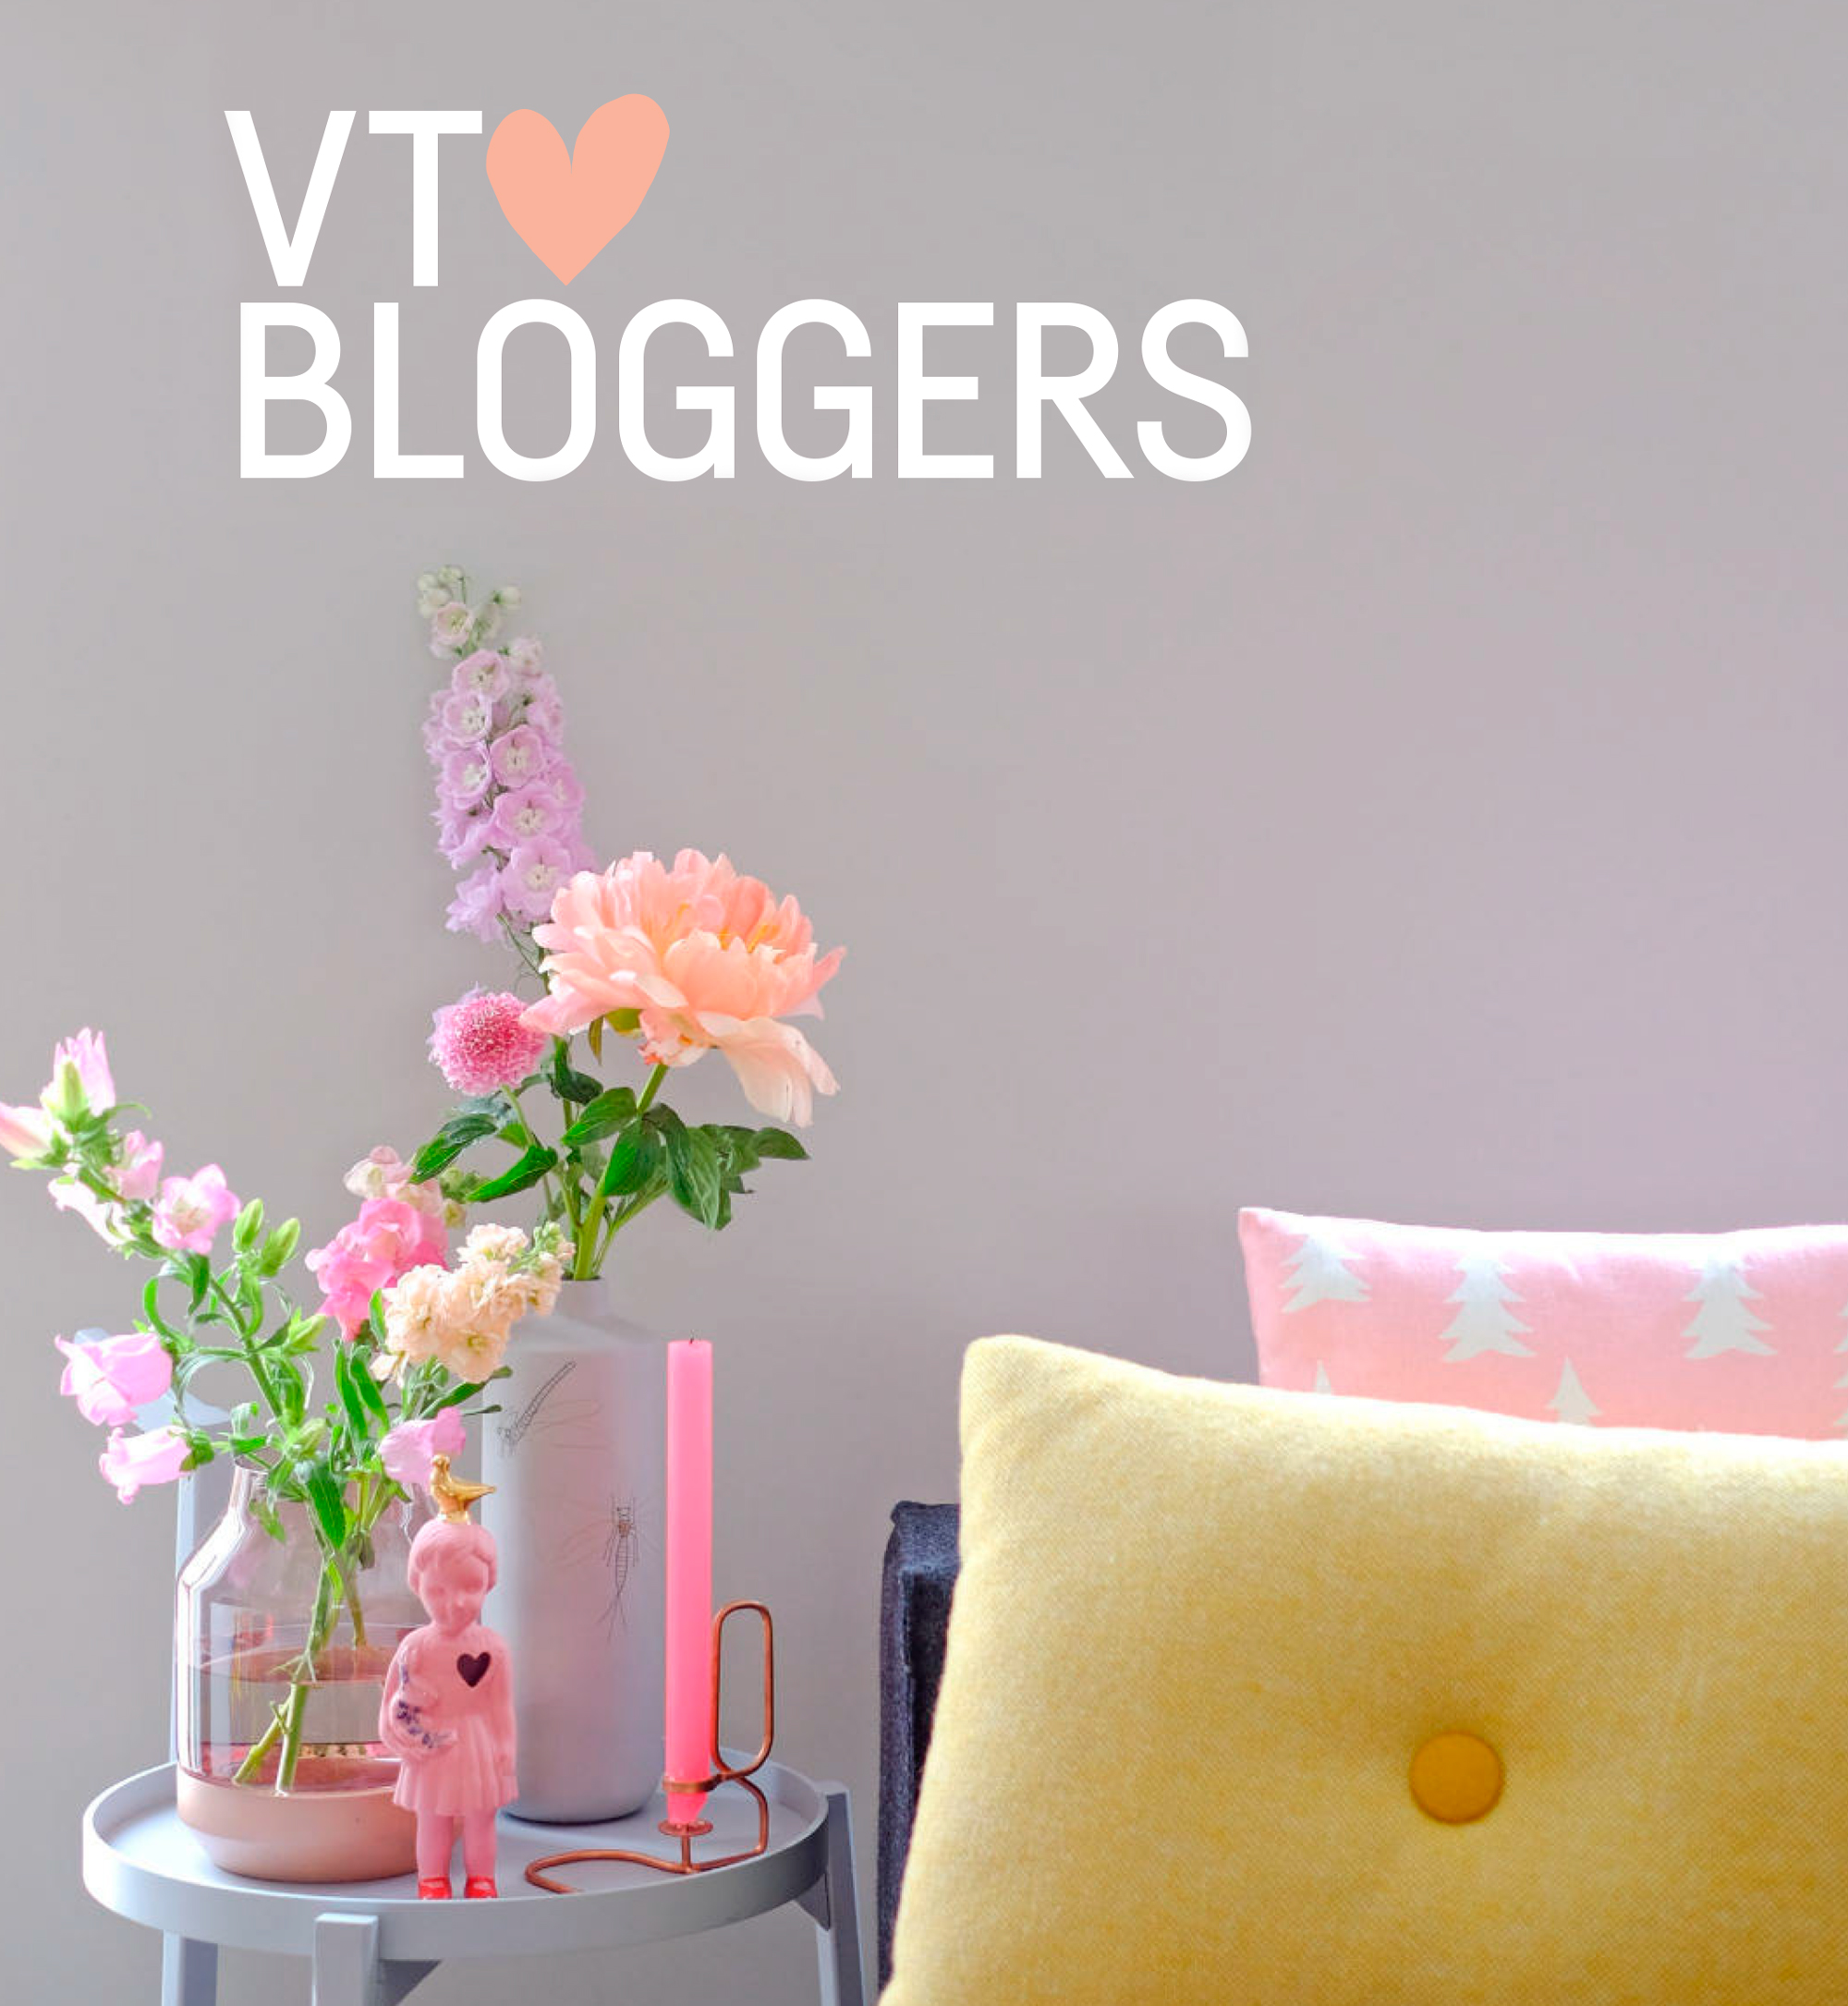 bloggercontest